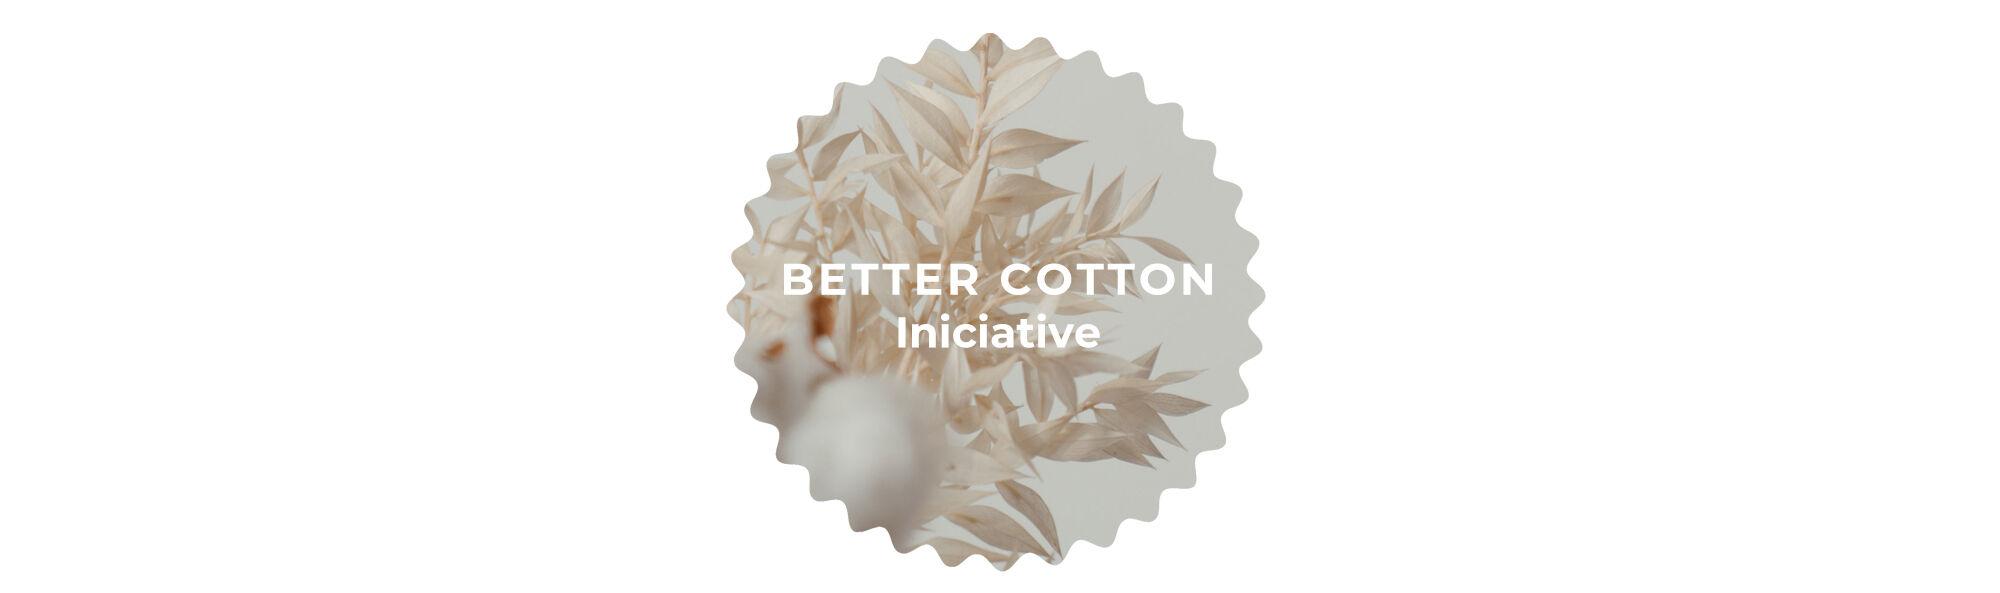 BETTER COTTON INICIATIVE